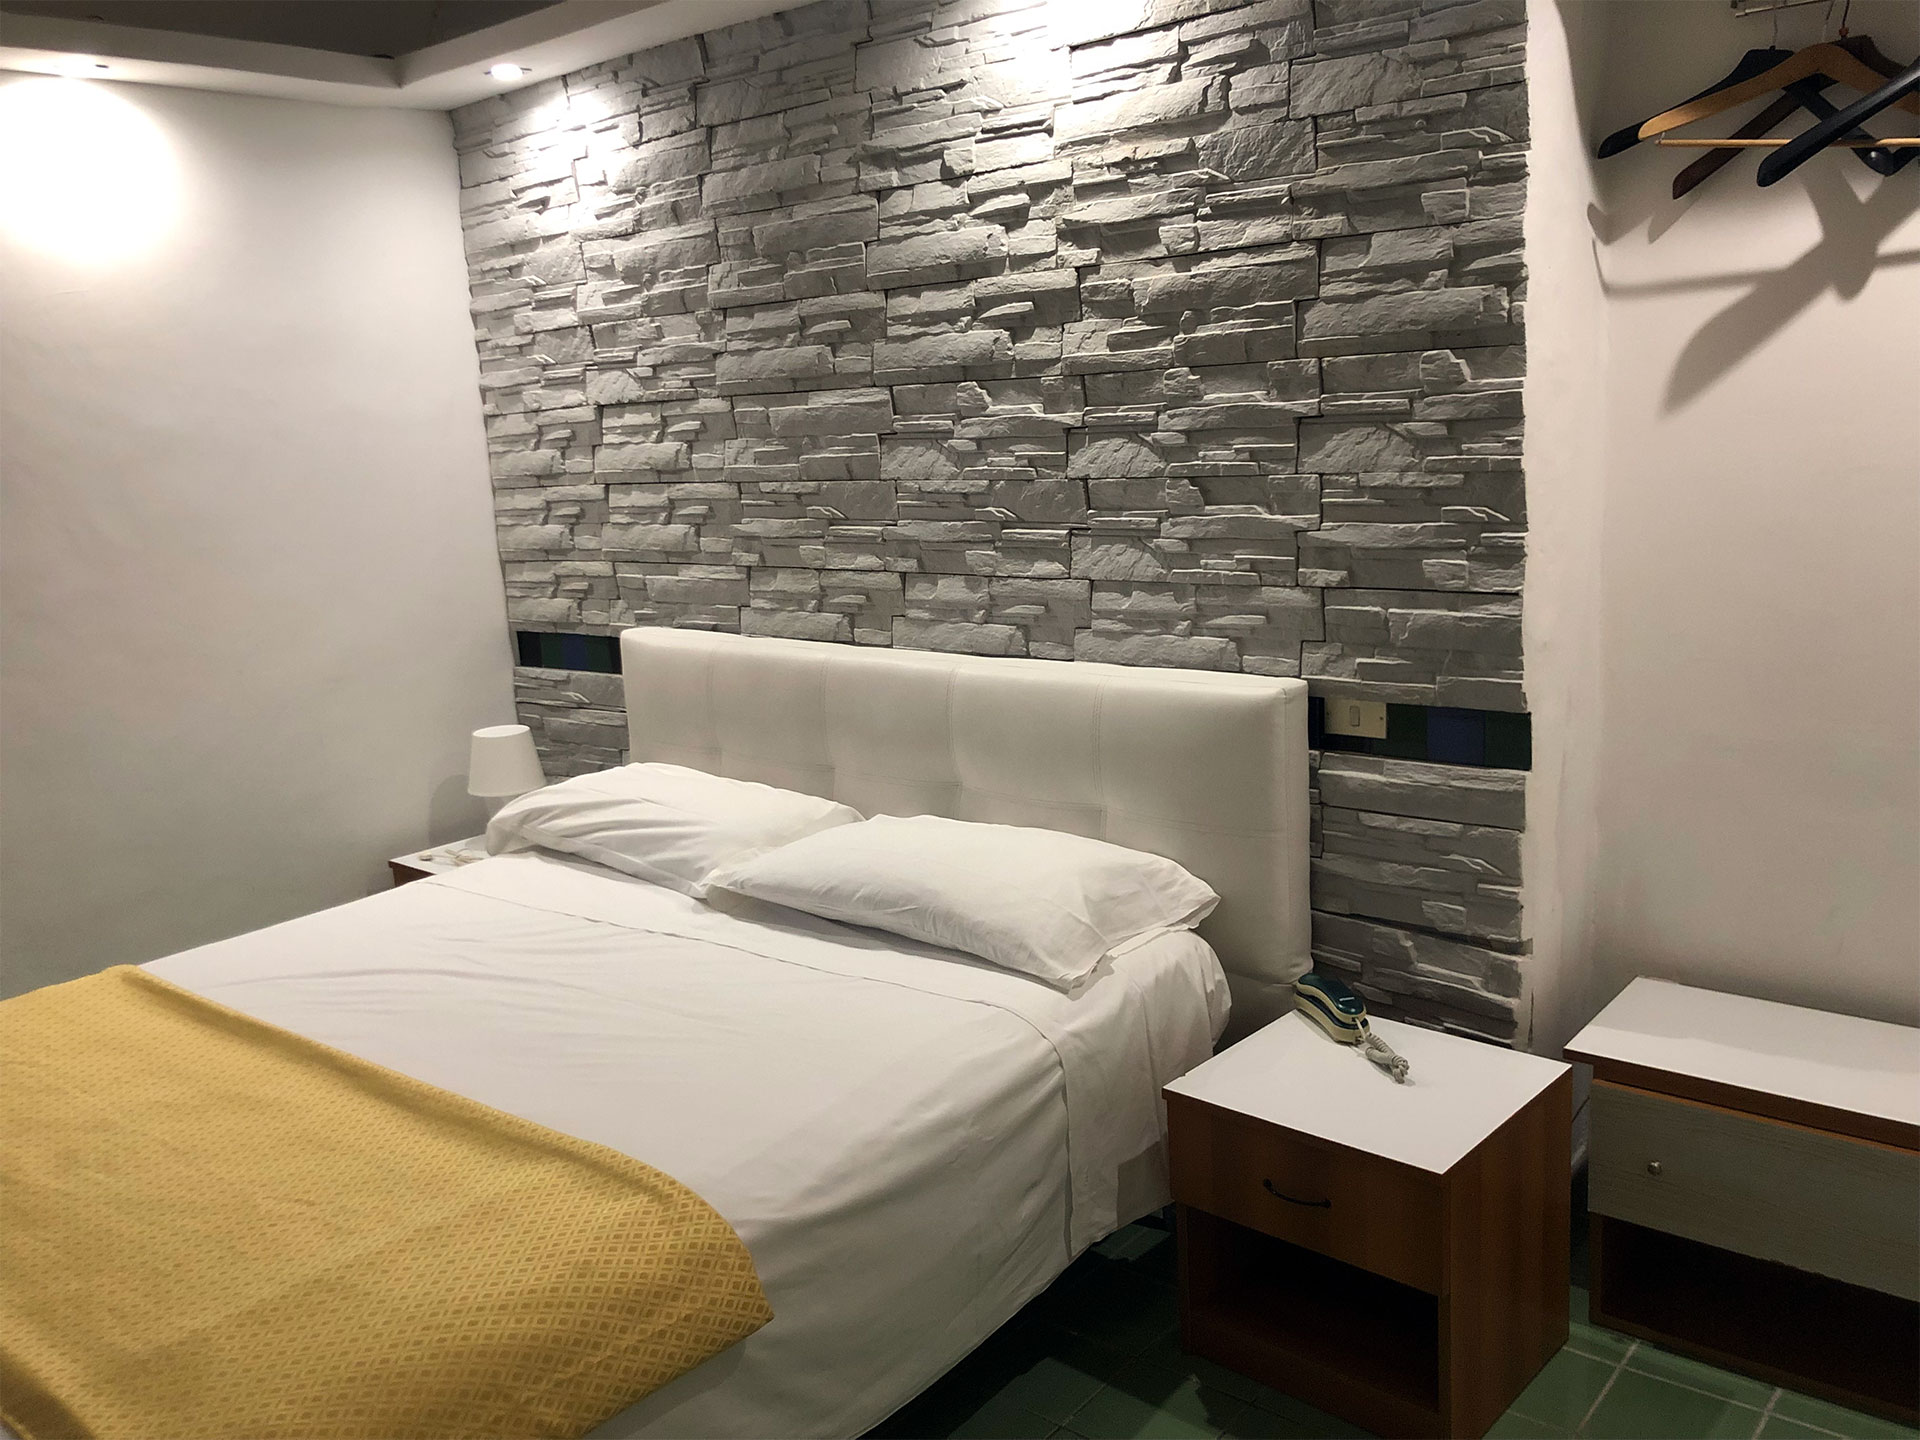 Matrimoniale standard Hotel Vietri Coast